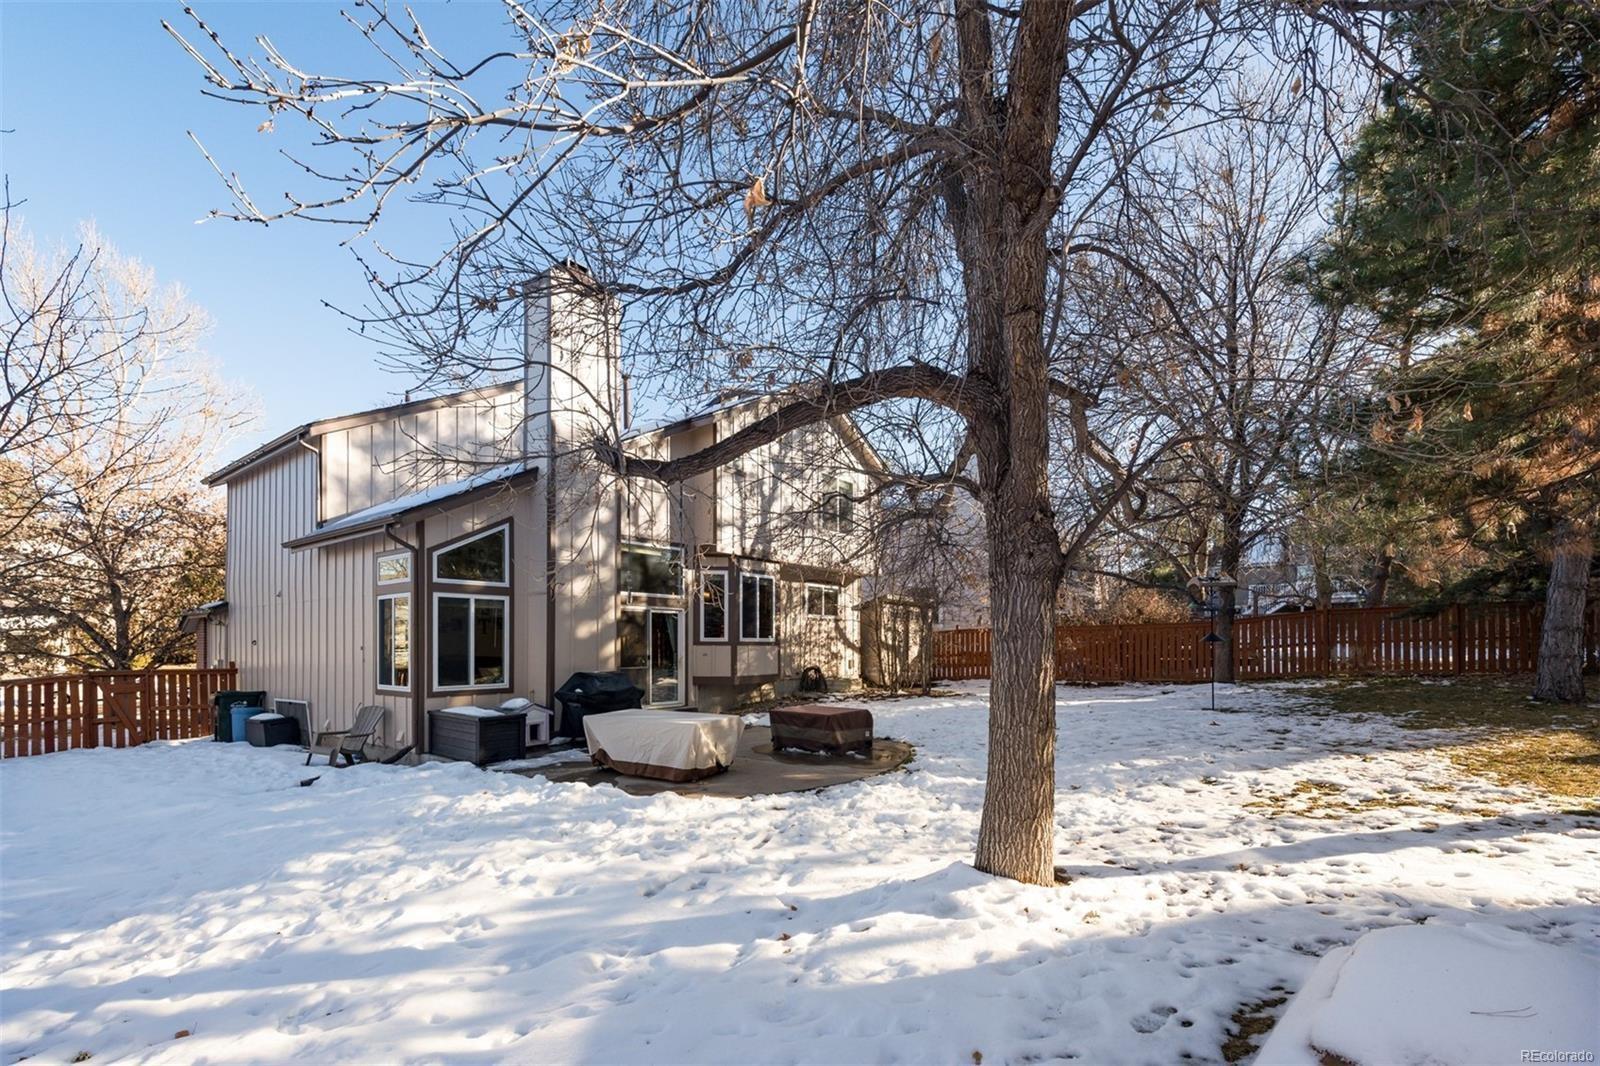 MLS# 5243579 - 32 - 9325 Windsor Way, Highlands Ranch, CO 80126